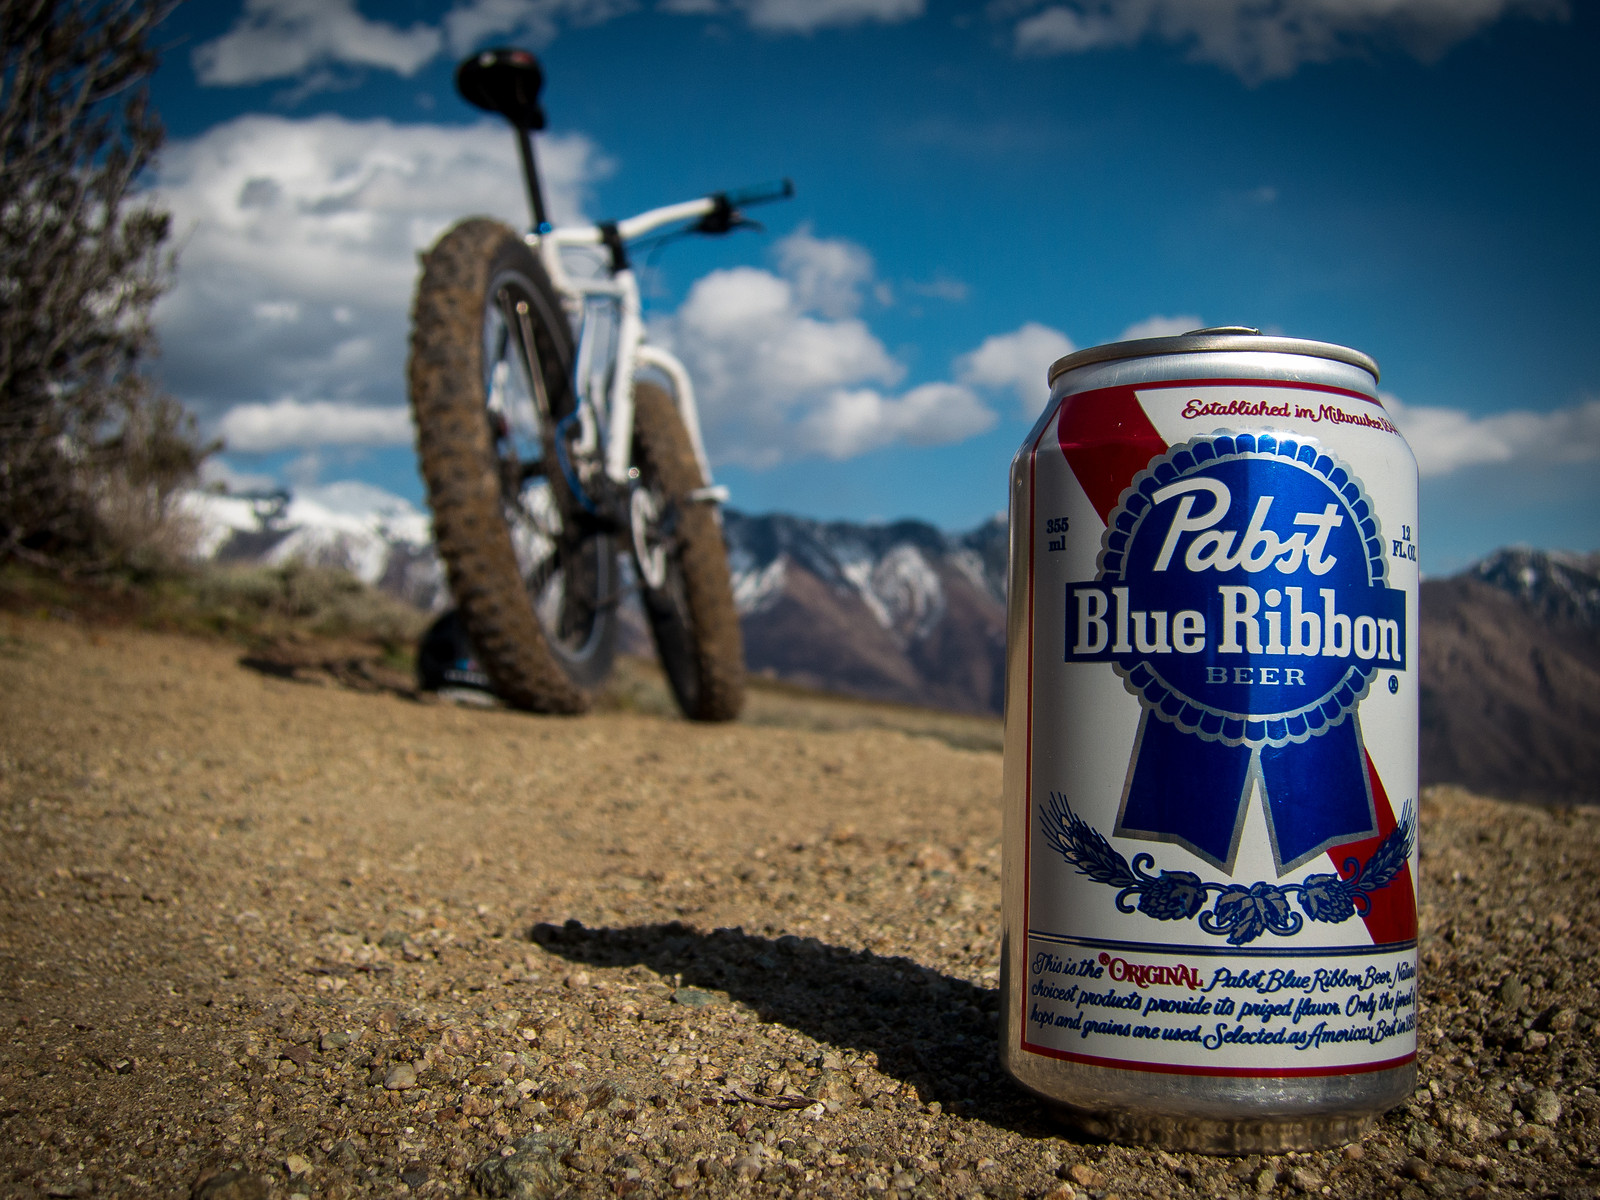 PBR - Code Runner - Mountain Biking Pictures - Vital MTB